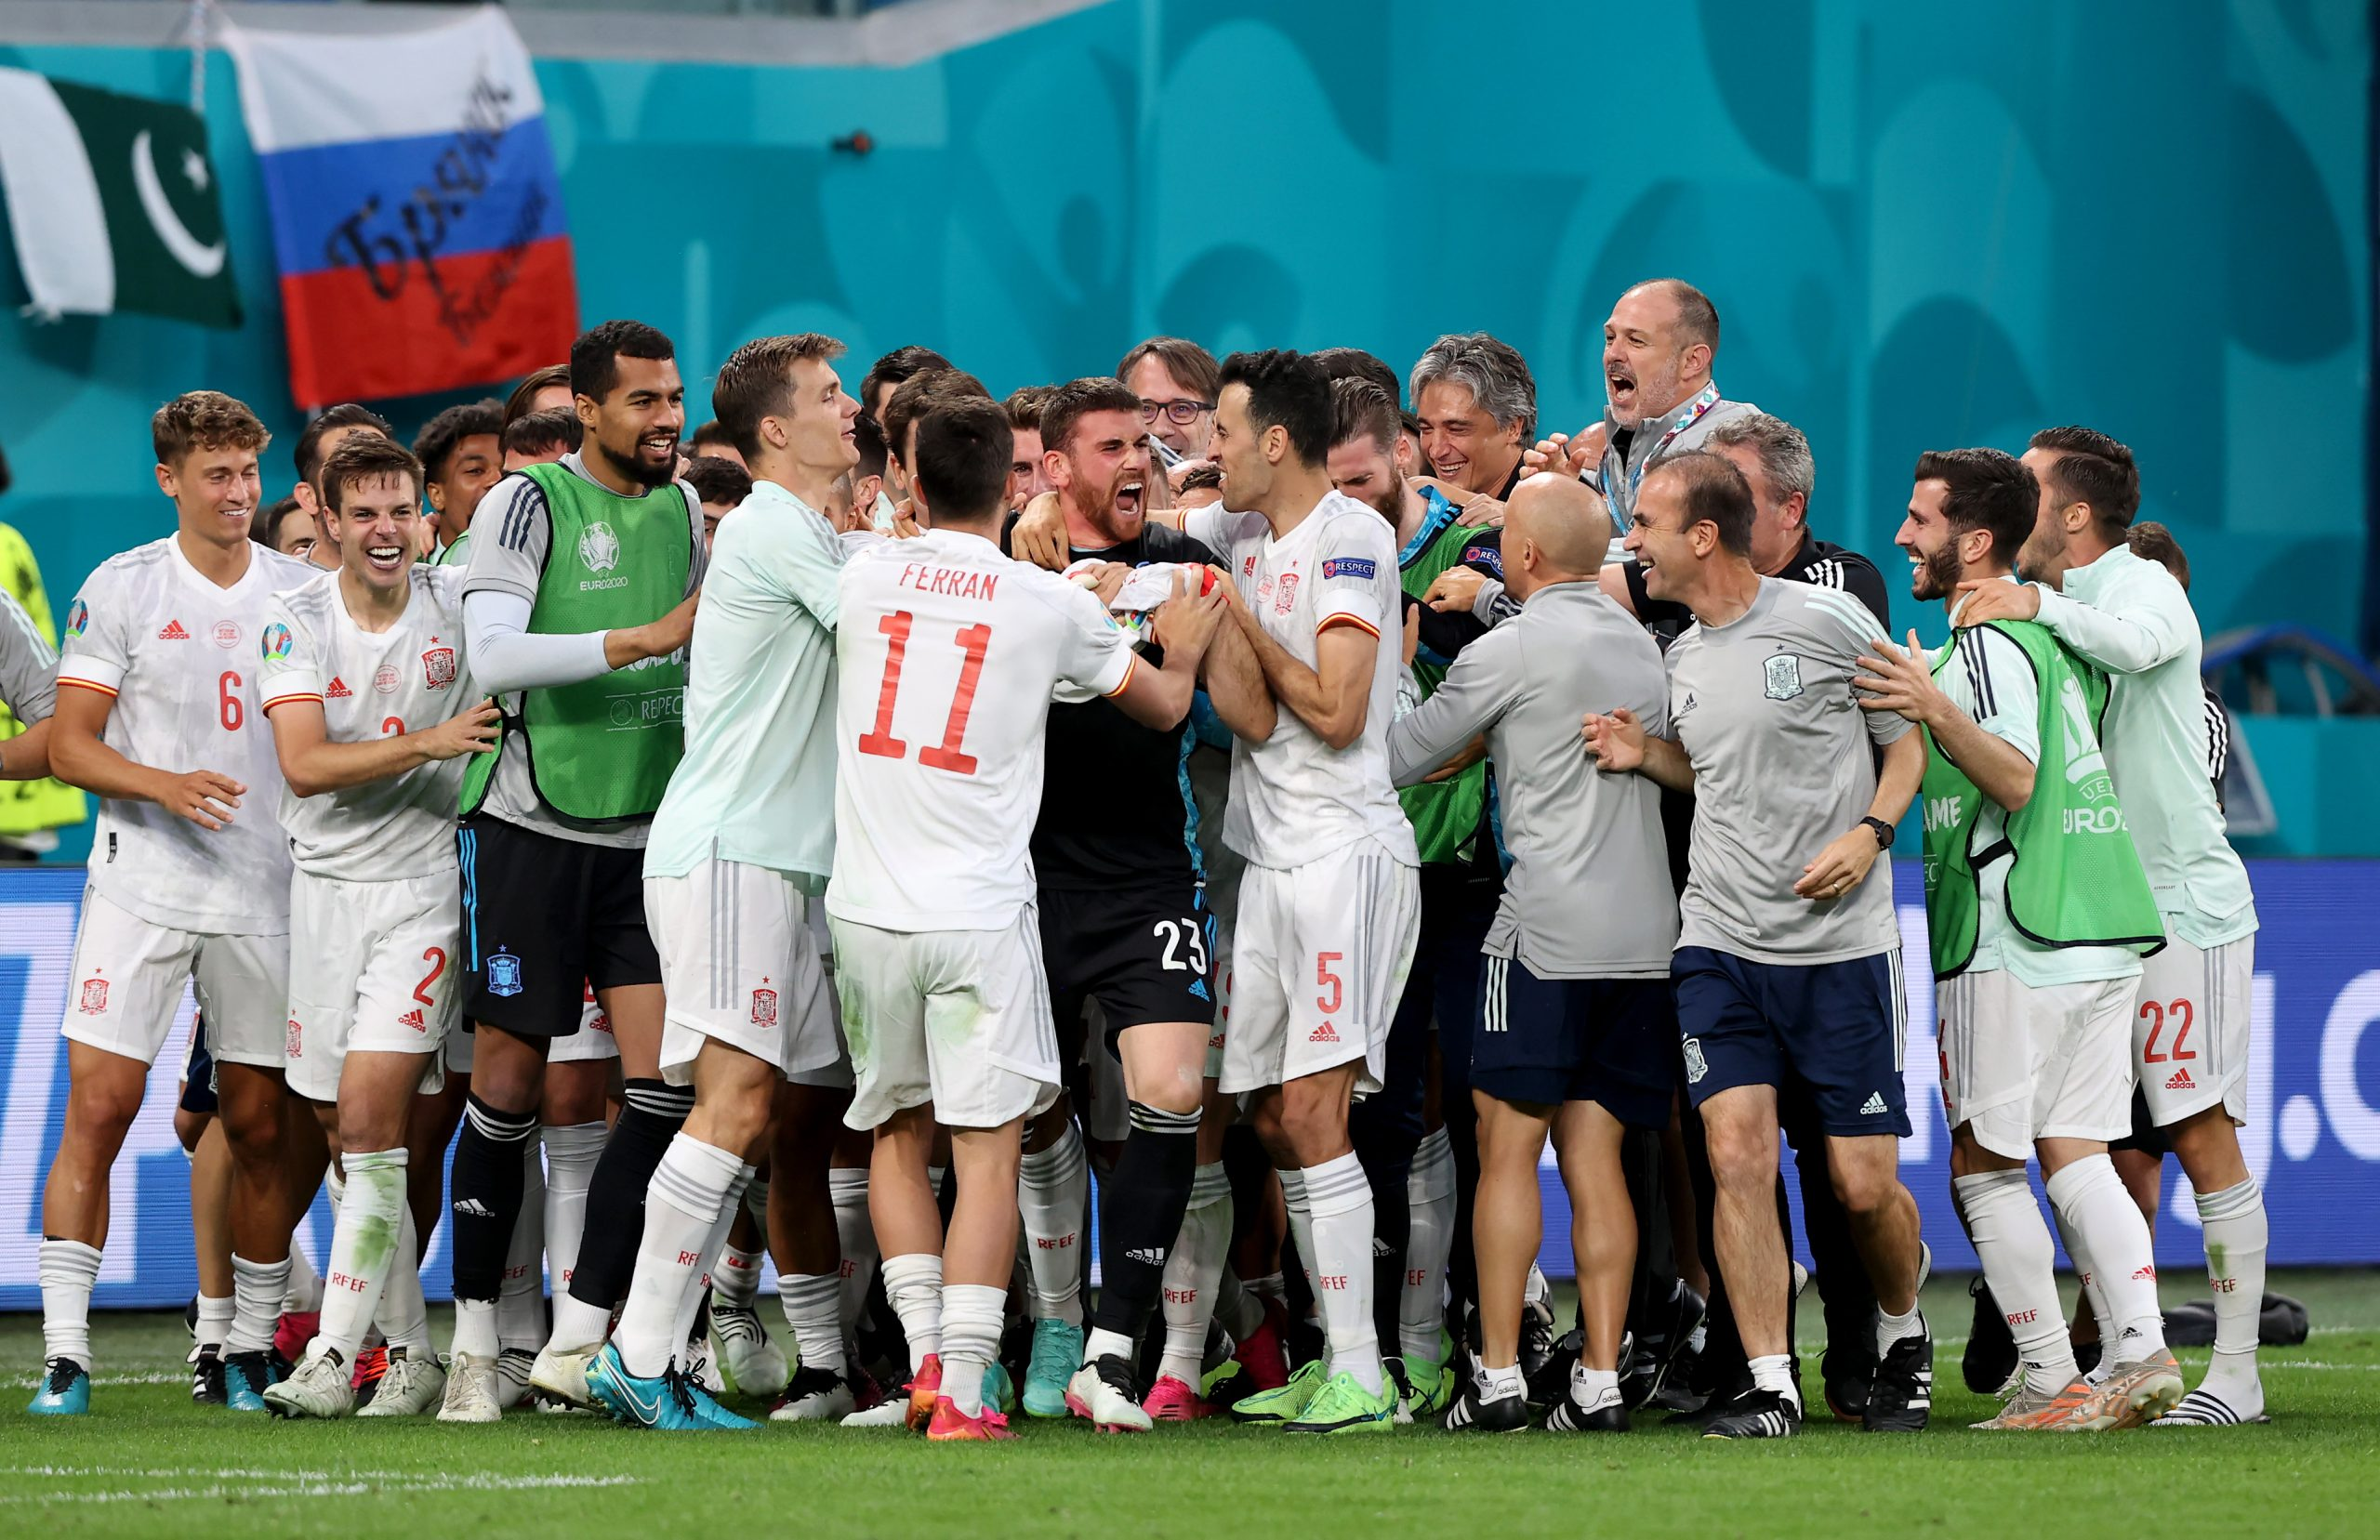 España pasa a la semifinal de la Eurocopa tras ganar a Suiza